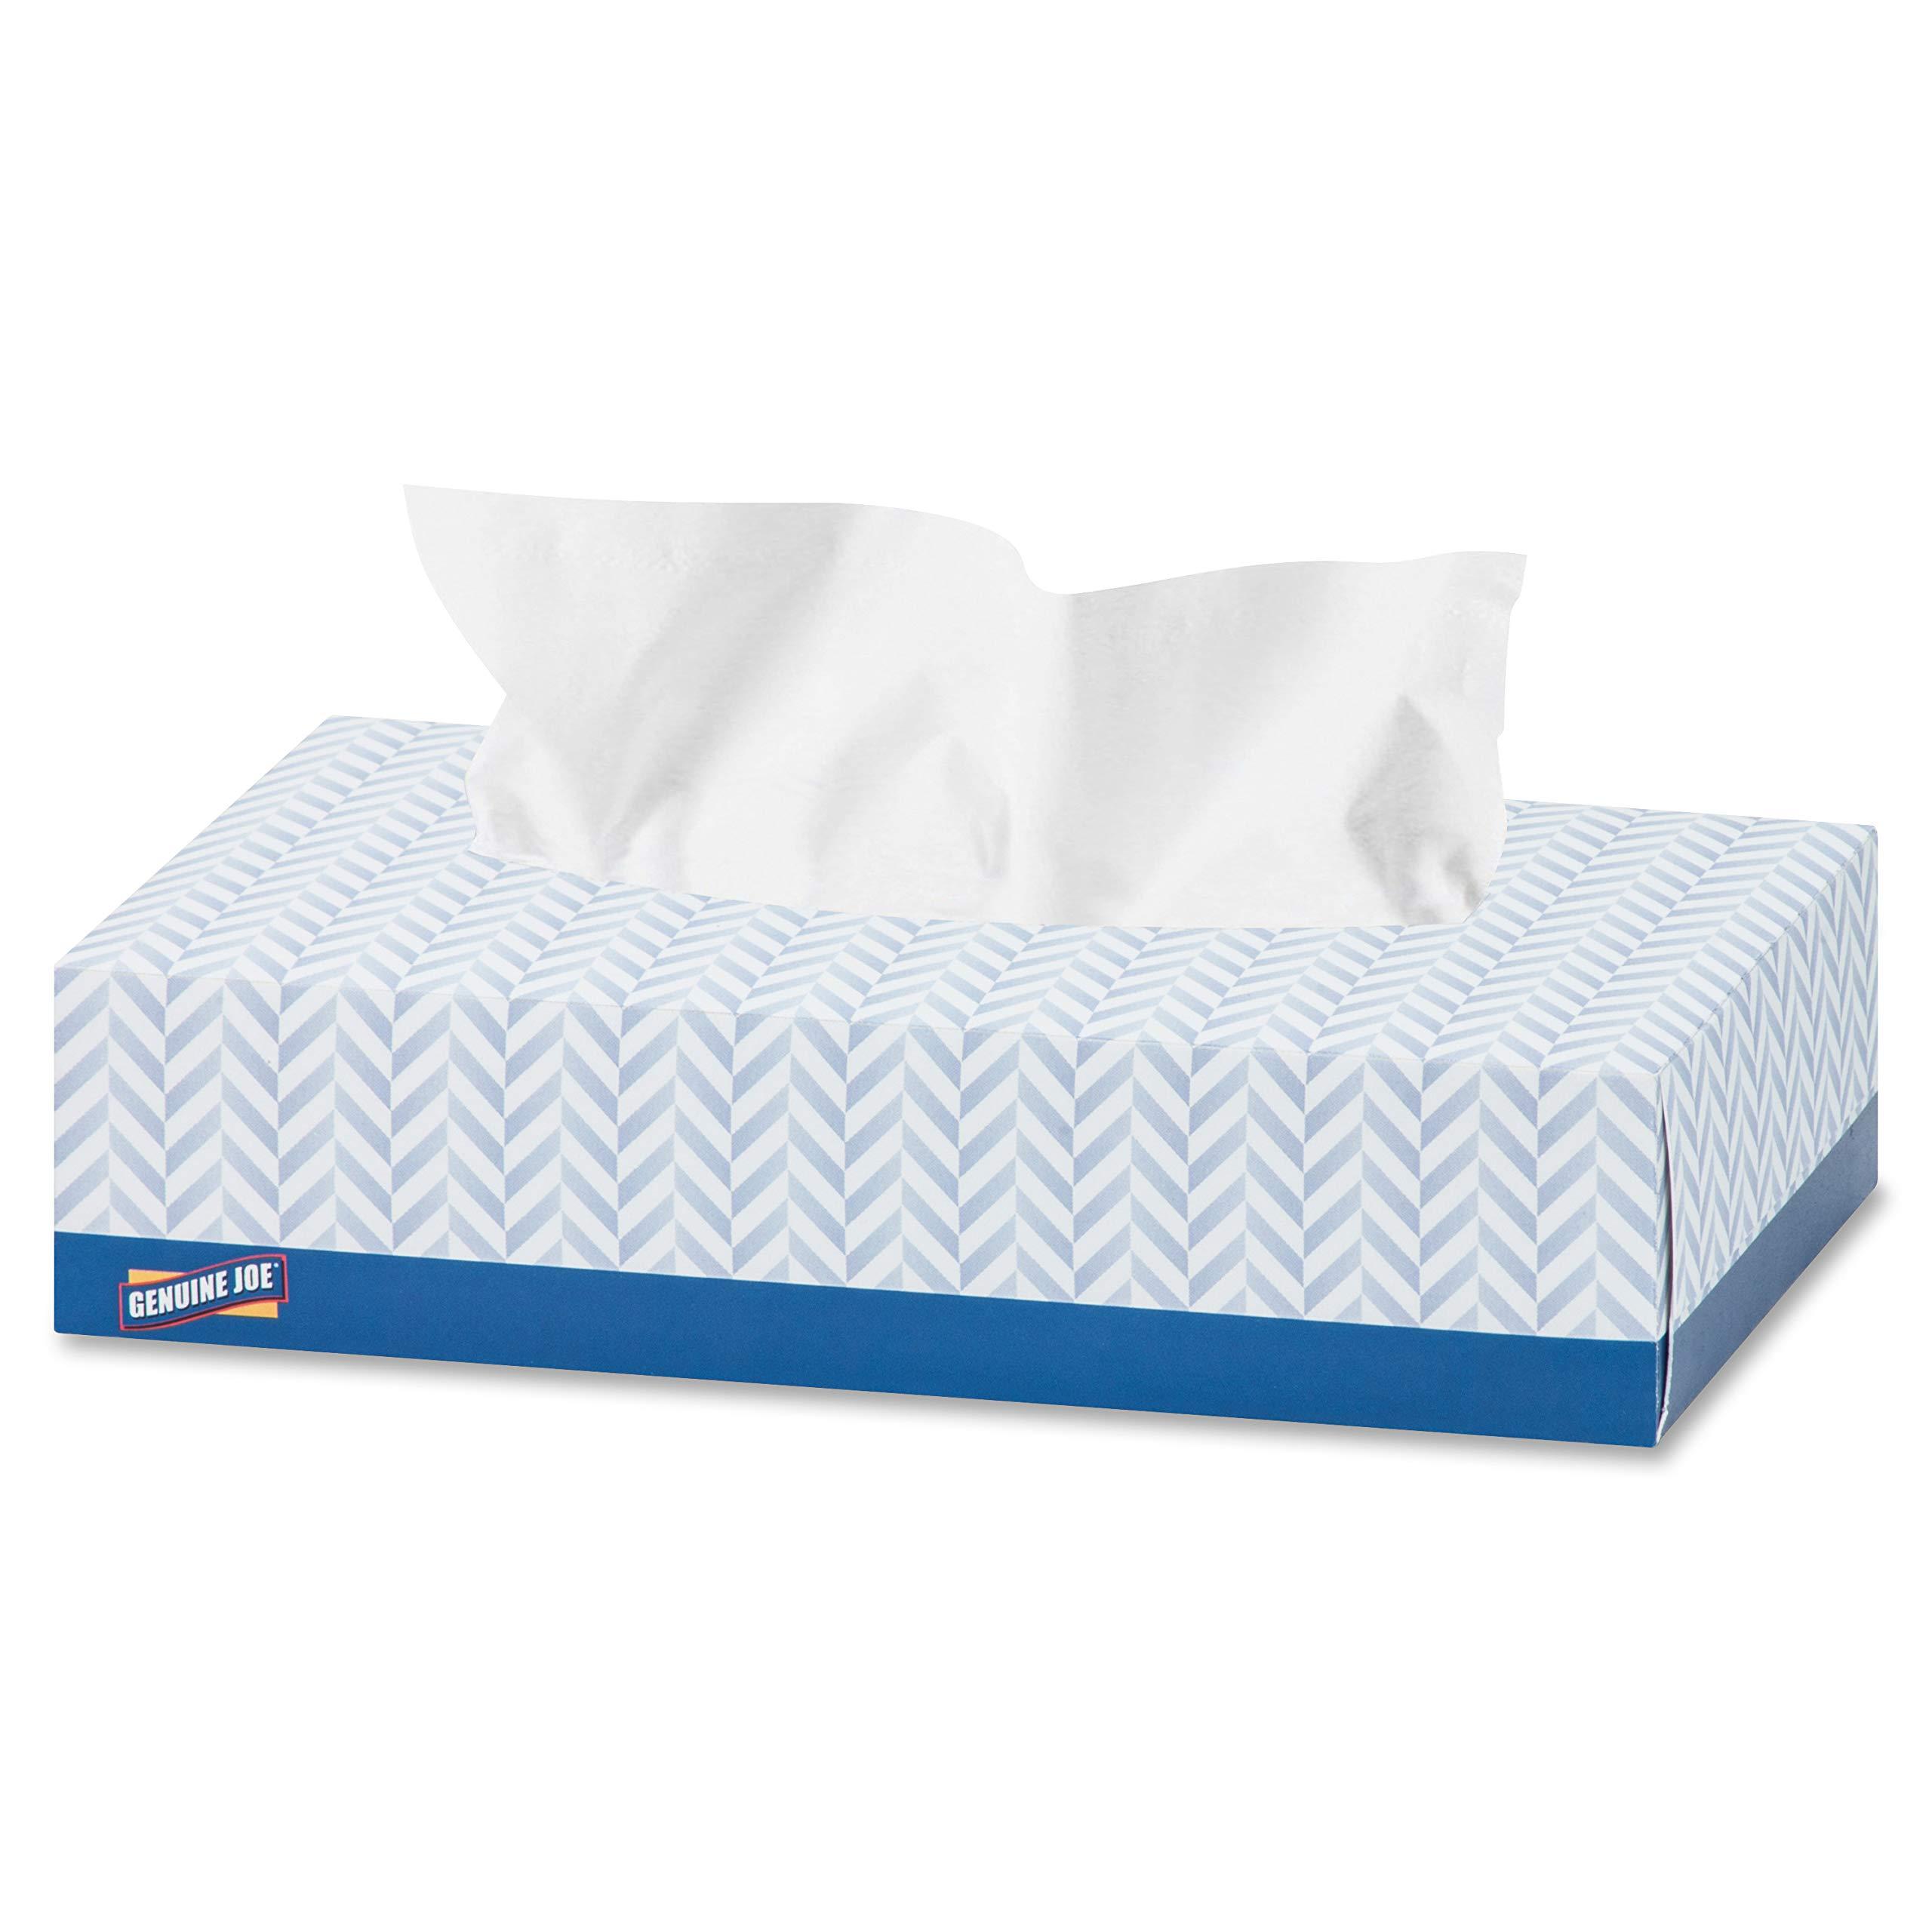 Genuine Joe 2-Ply Facial Tissue